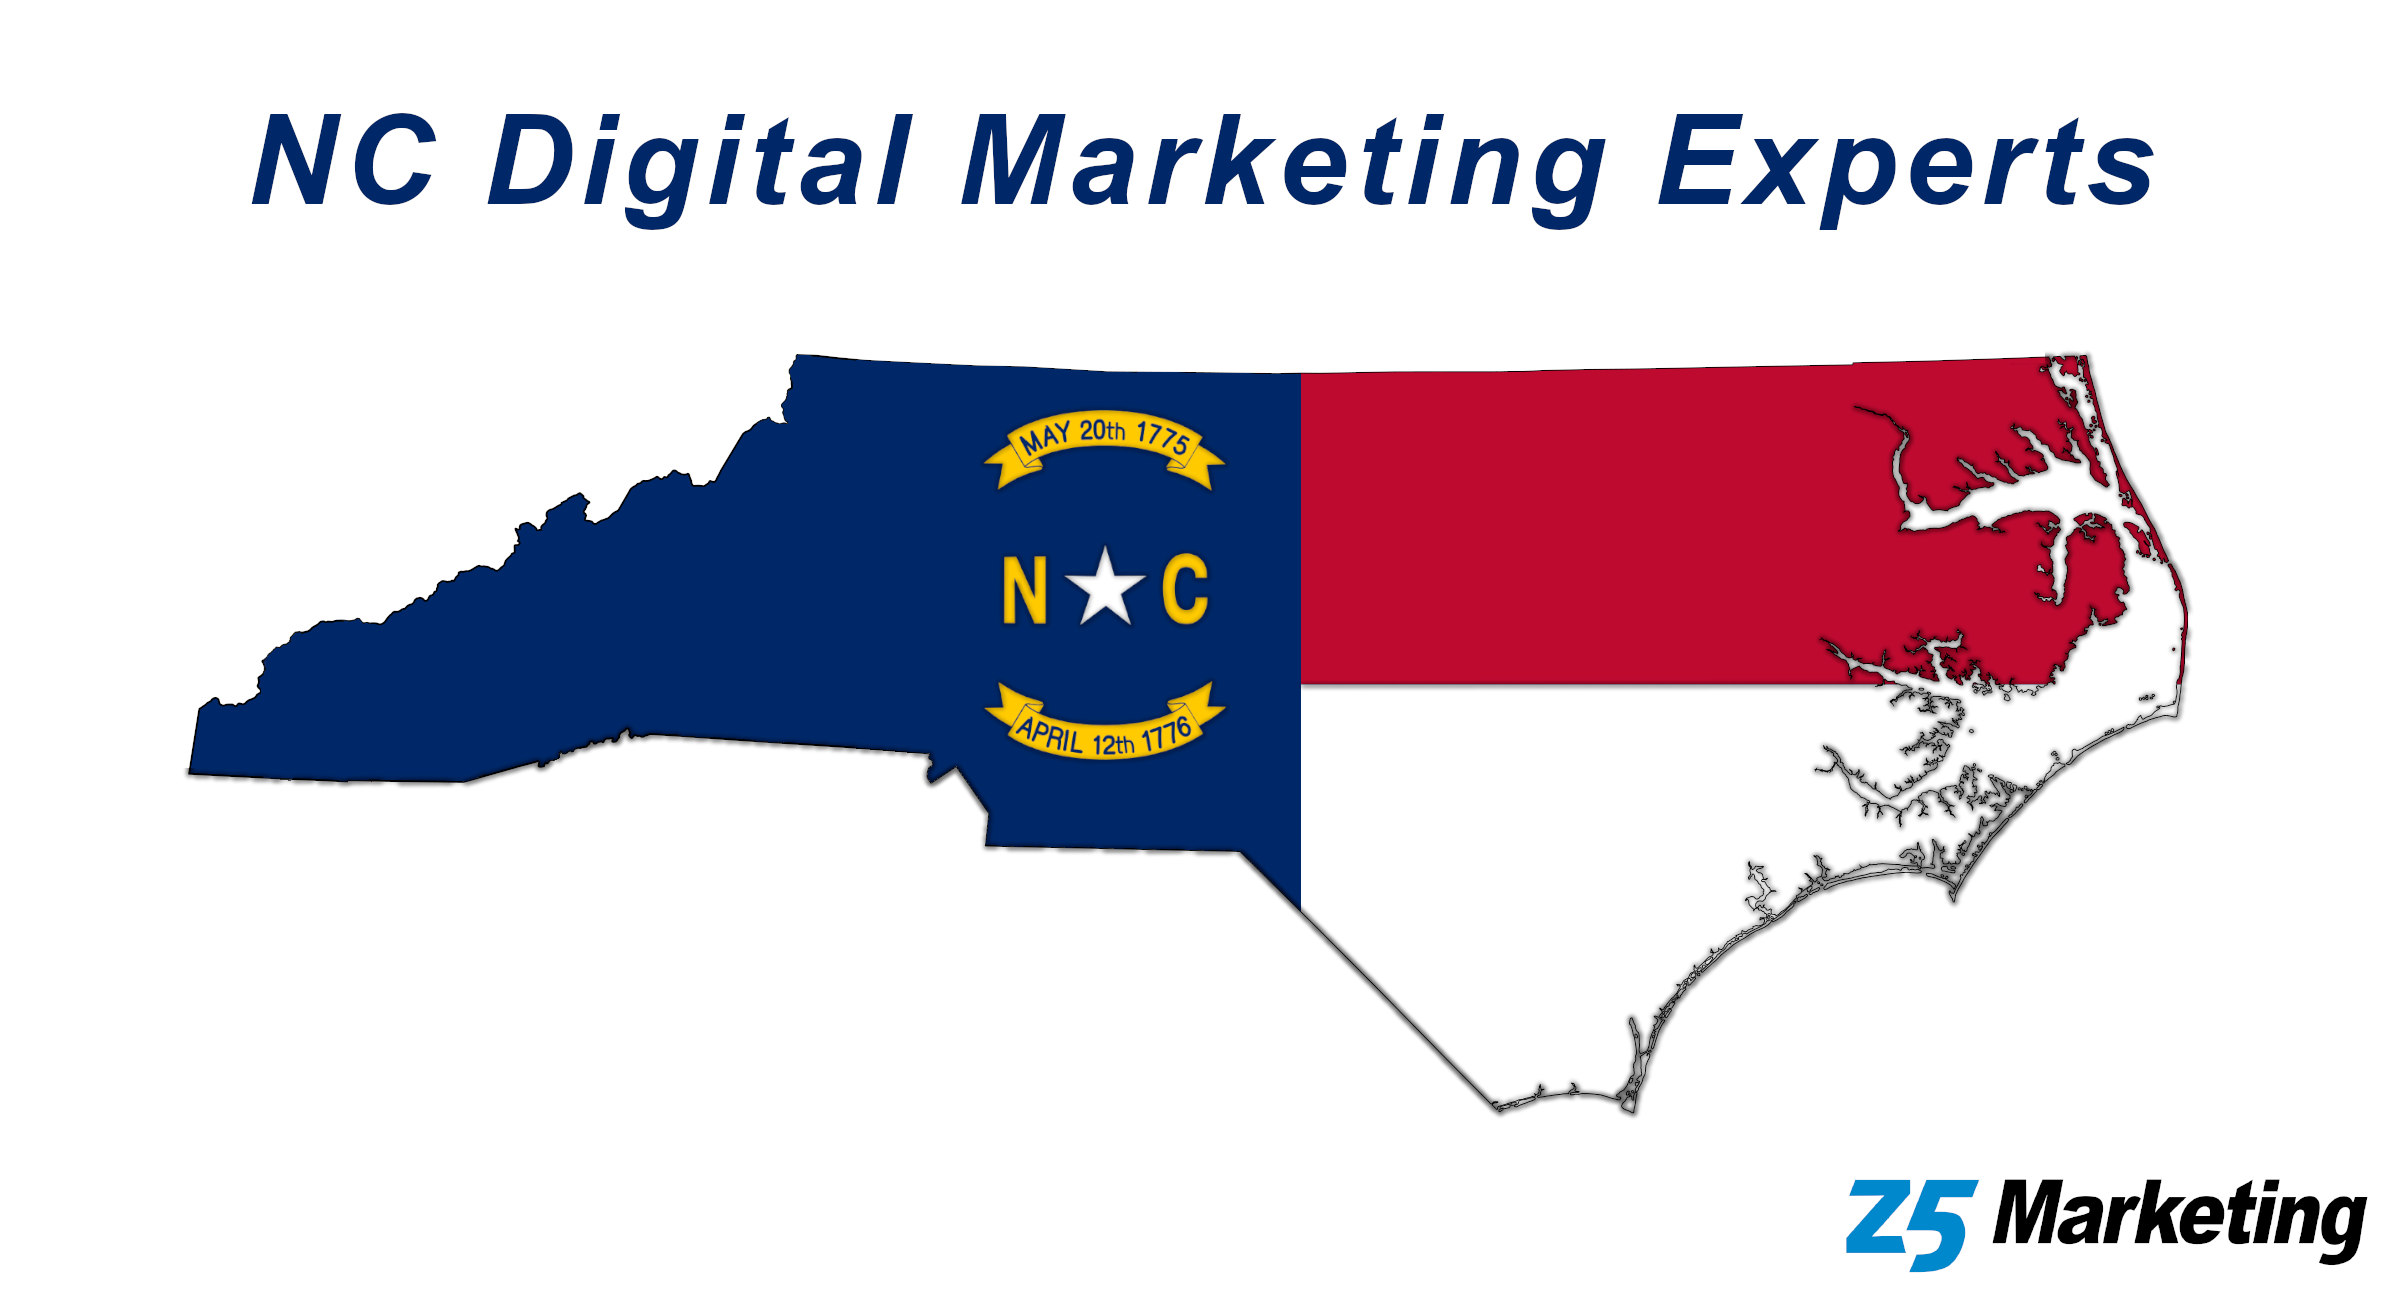 NC digital marketing experts